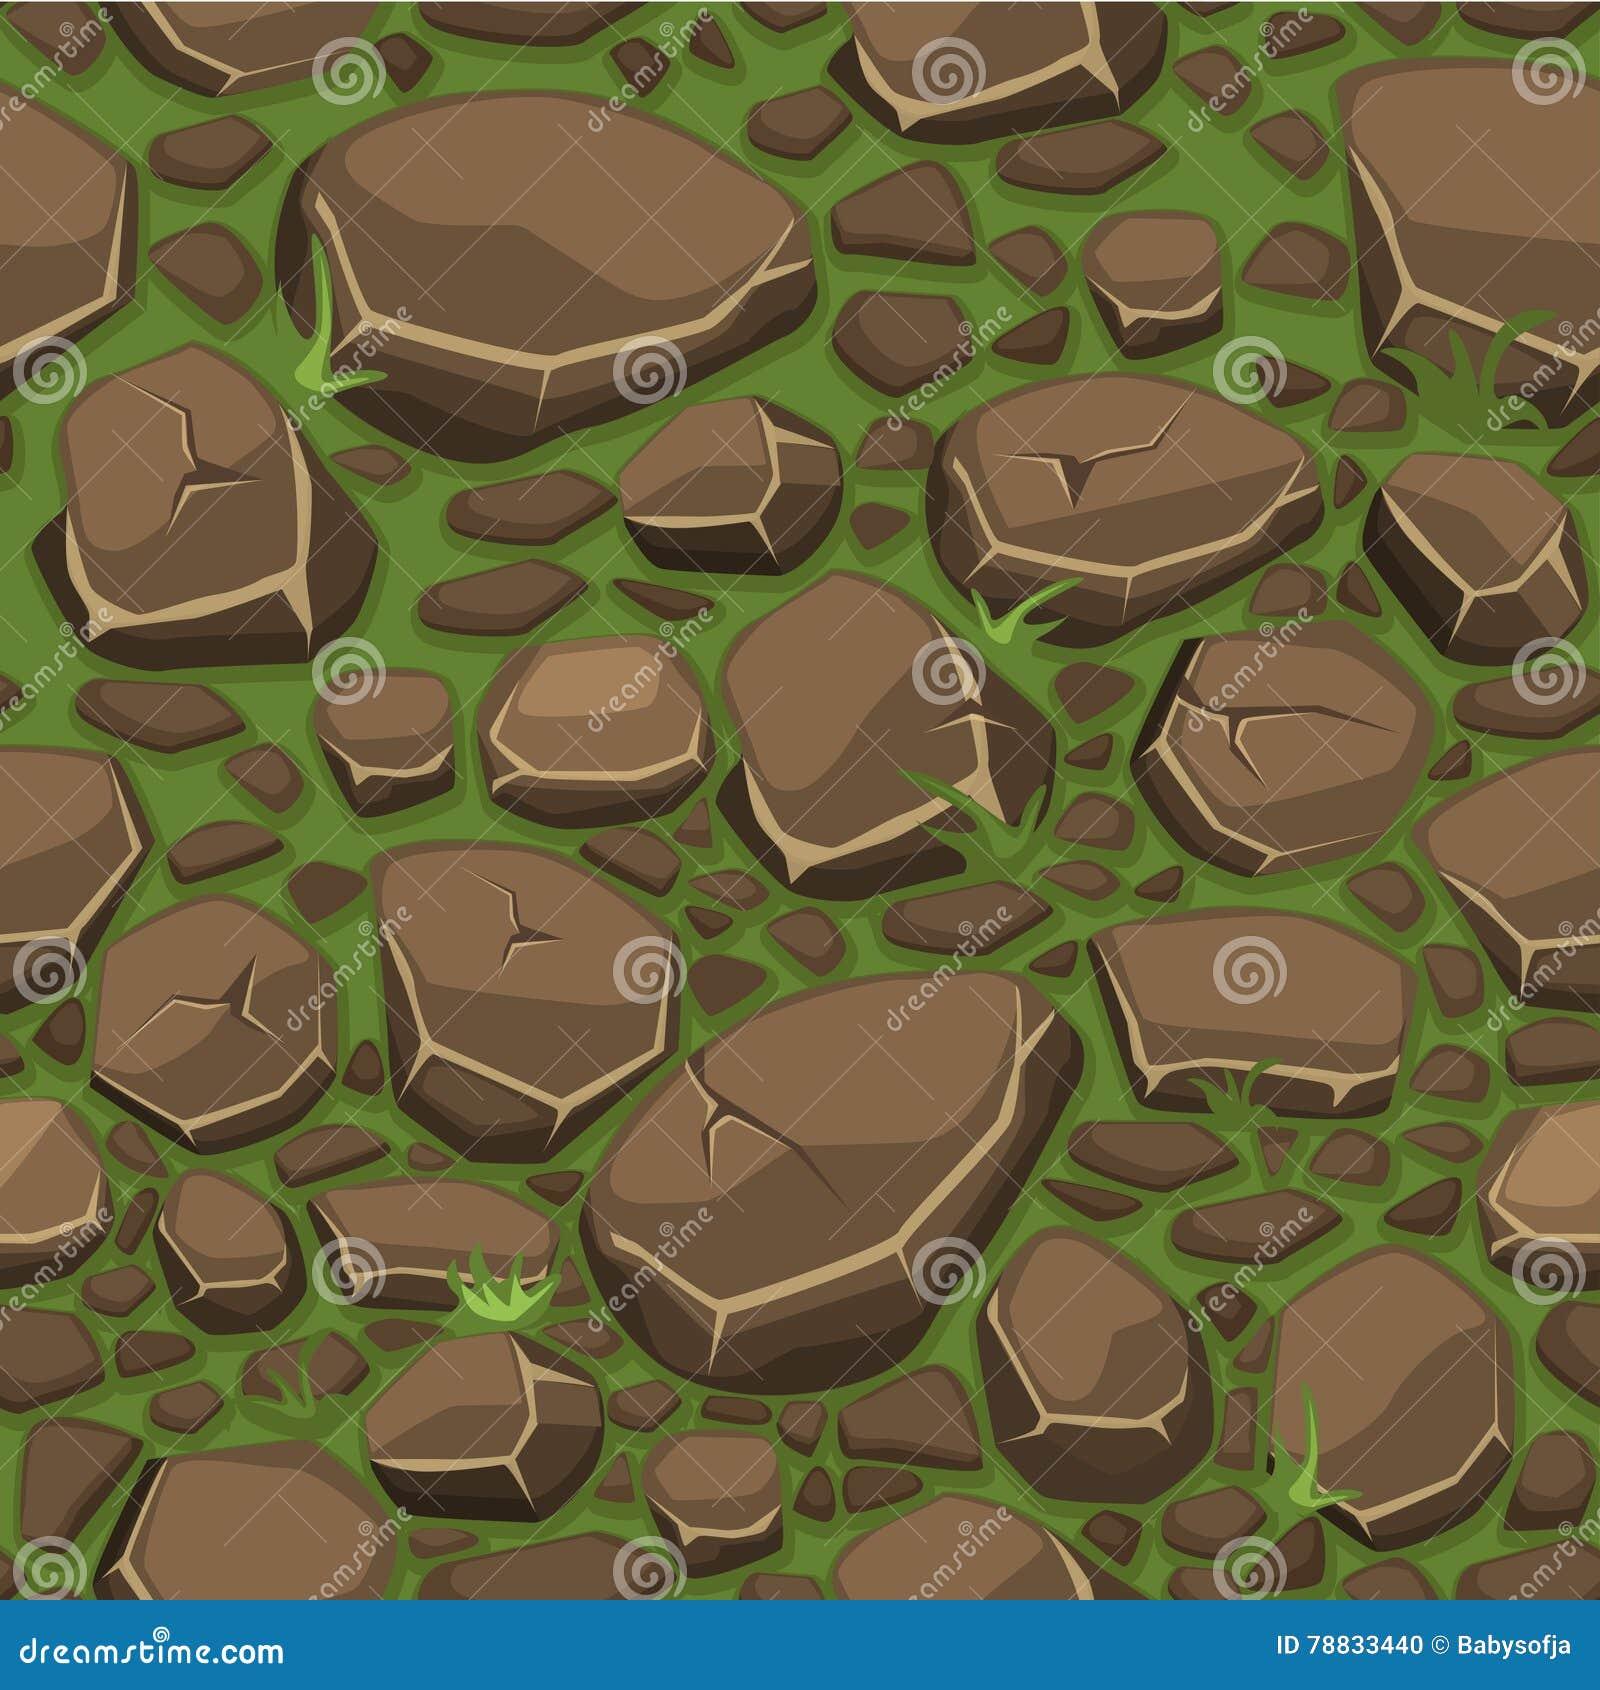 cartoon square stones texture - photo #41